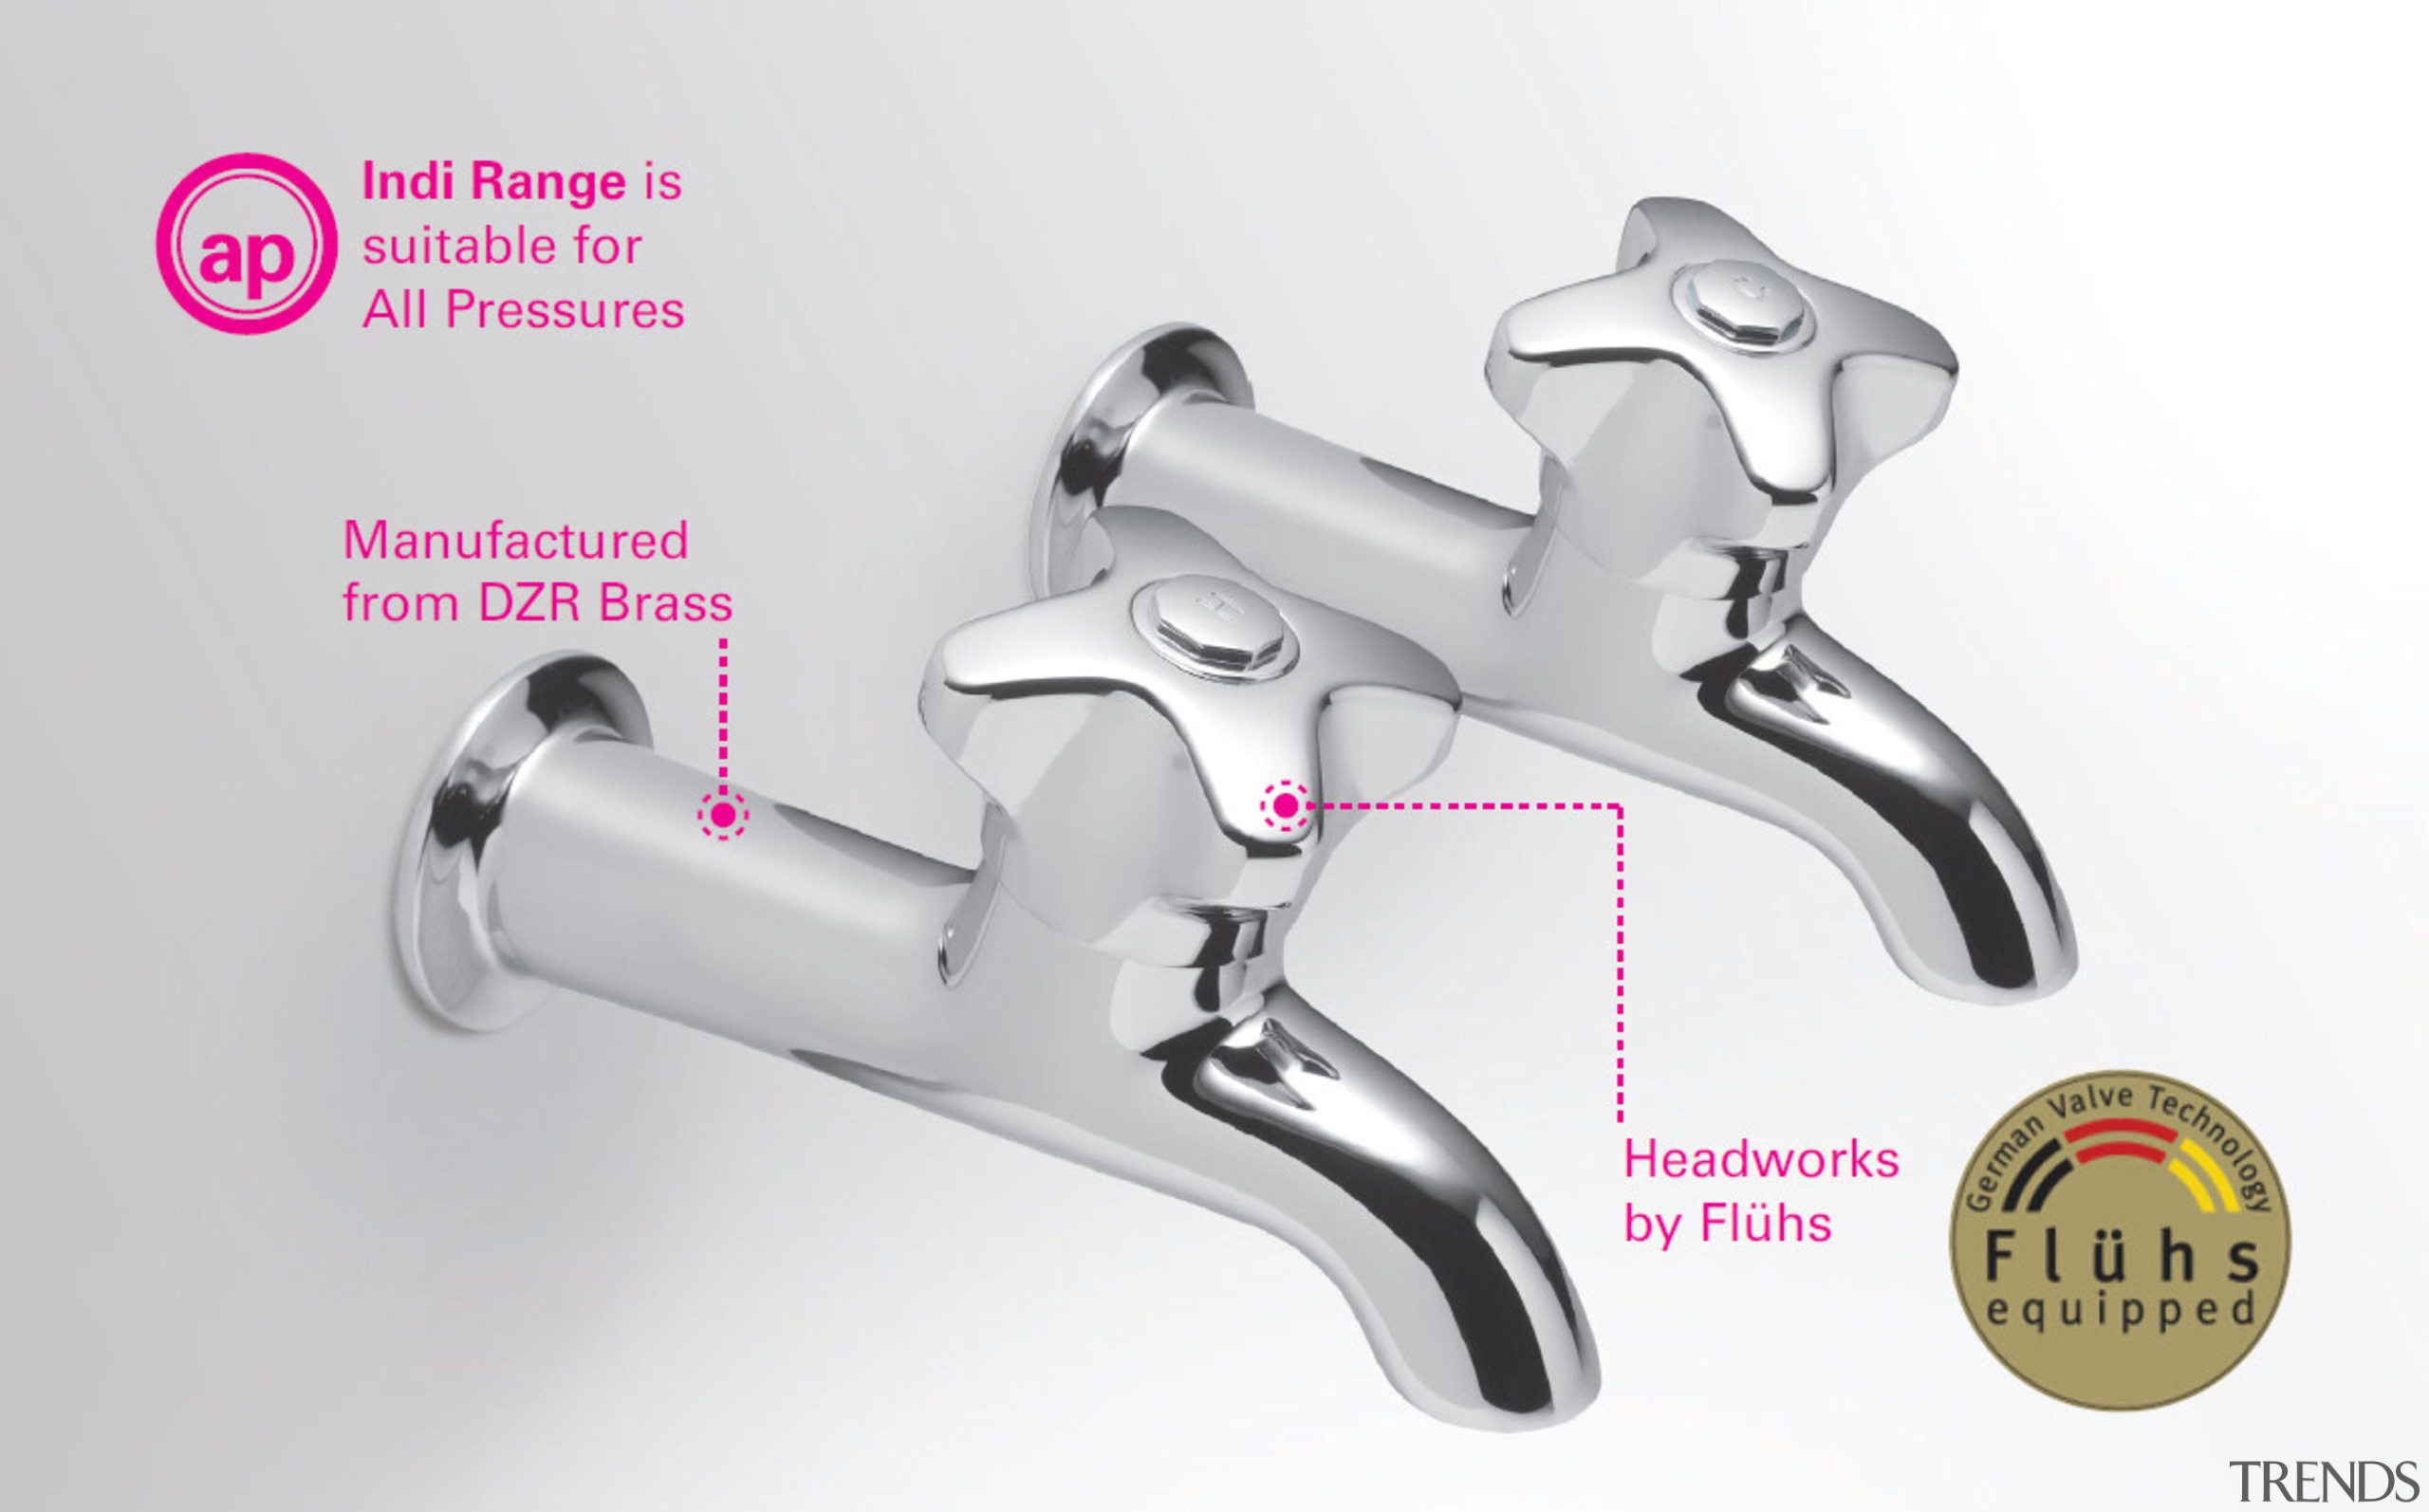 Timeless, yet modern – the Felton Indi range font, hardware, plumbing fixture, product, product design, tap, white